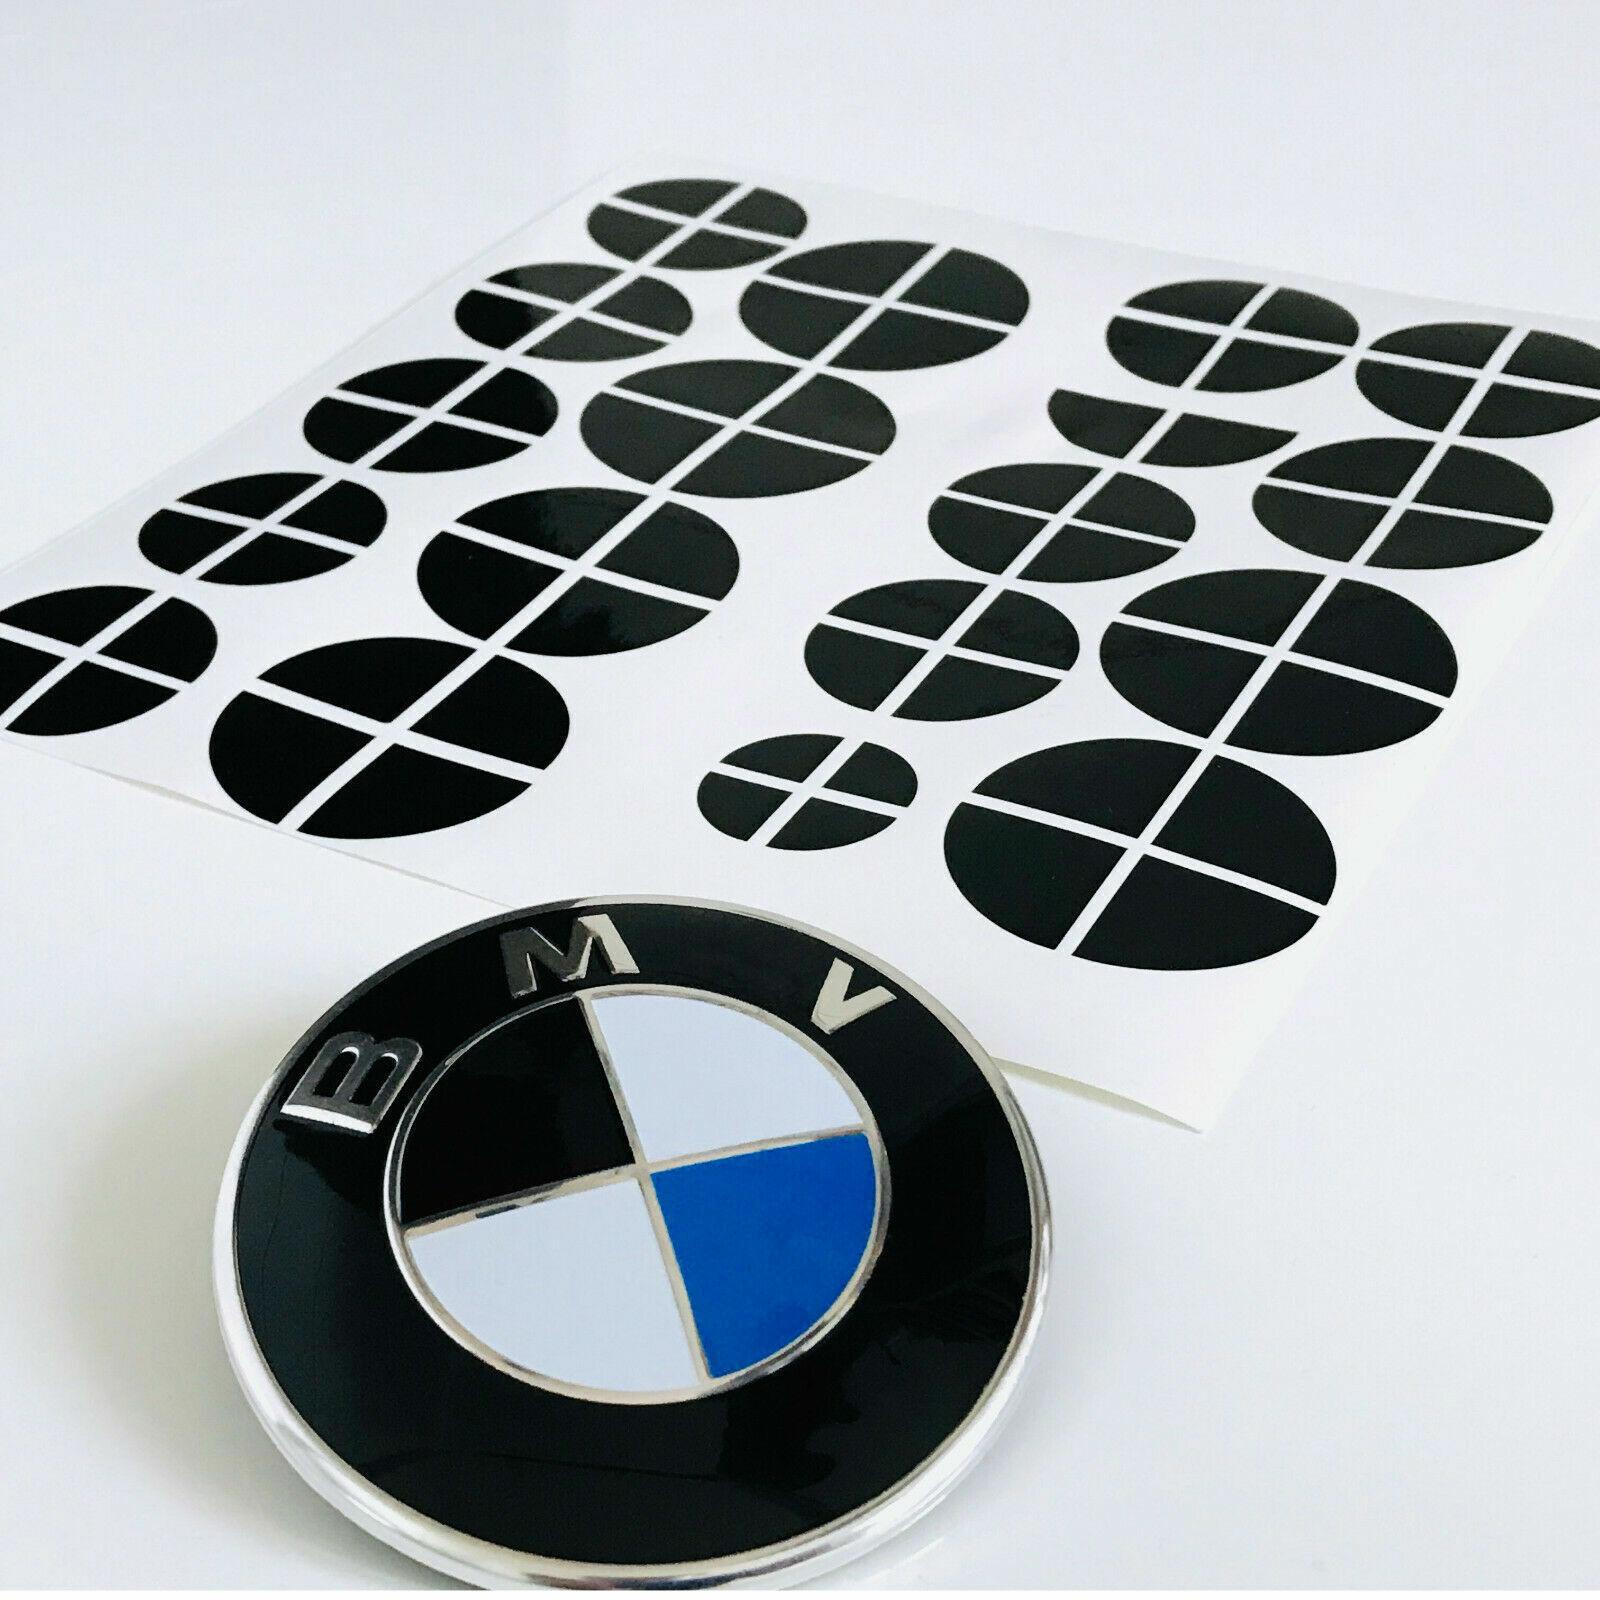 NEU 2 x Tüllen für BMW-Logo Emblem Motorhaube Z3 Z4 E85 E86 E89 Z8 51141807495